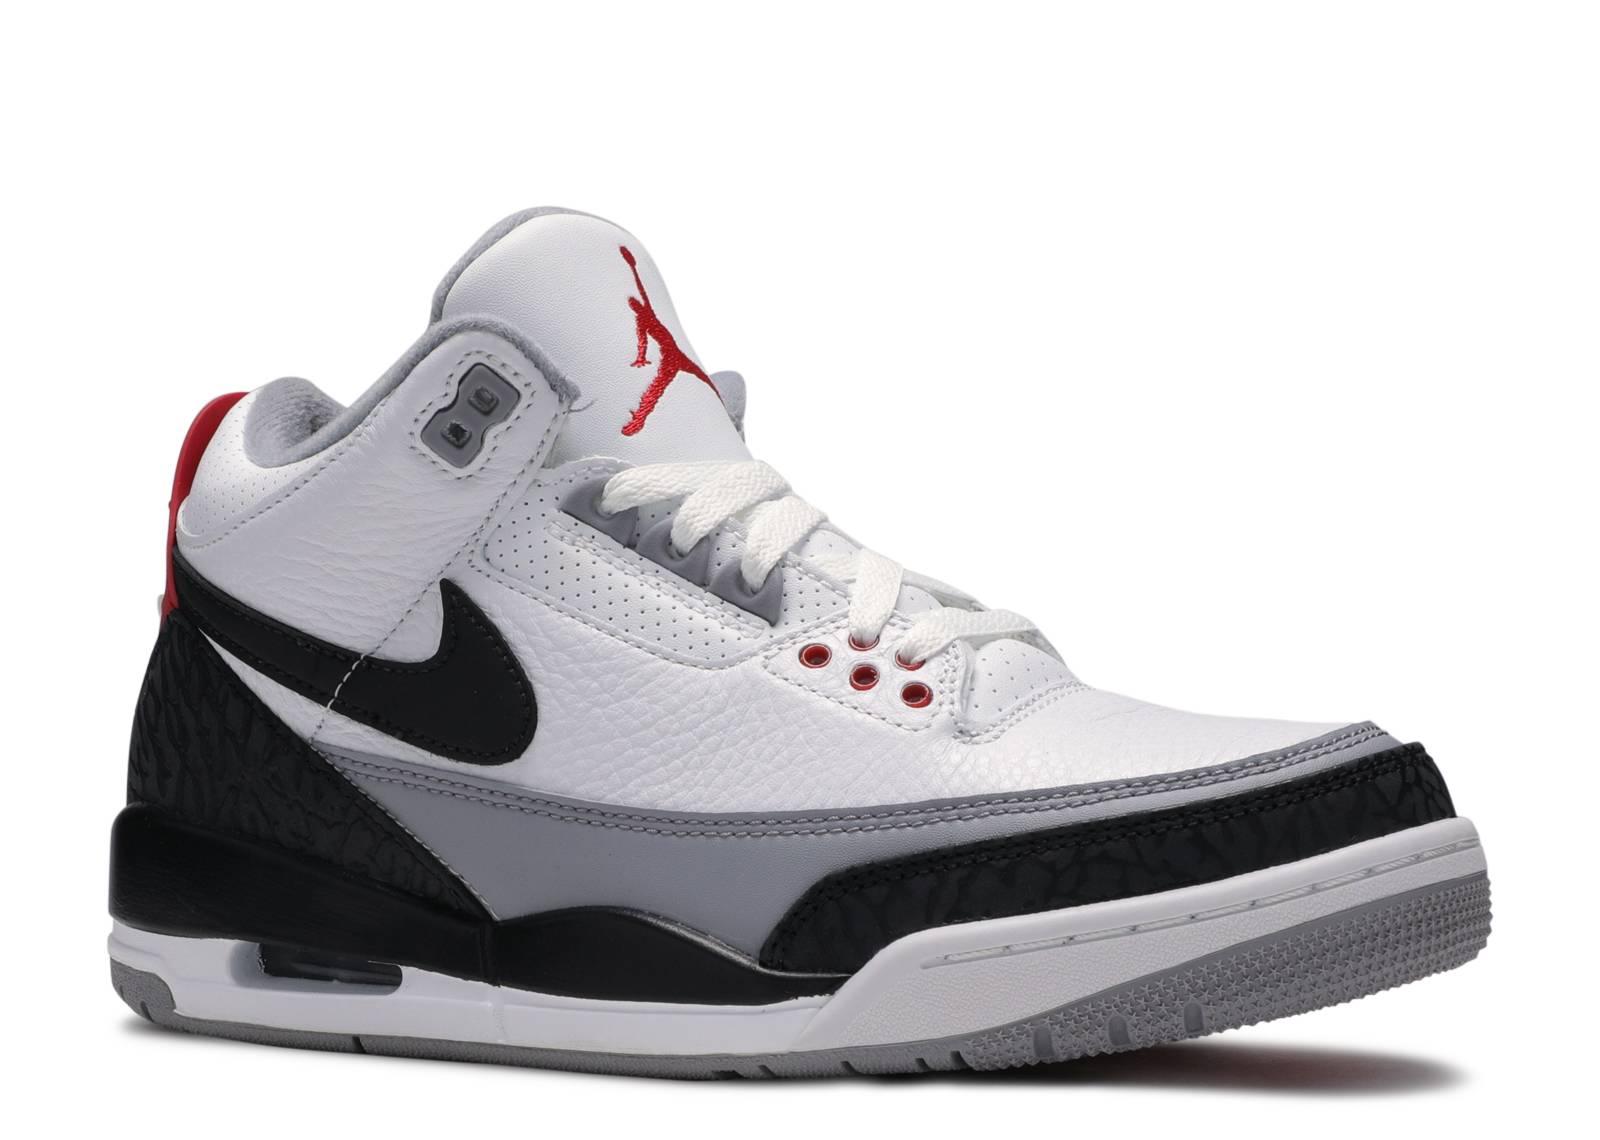 0eb4cbdaf1f Air Jordan 3 Retro Nrg